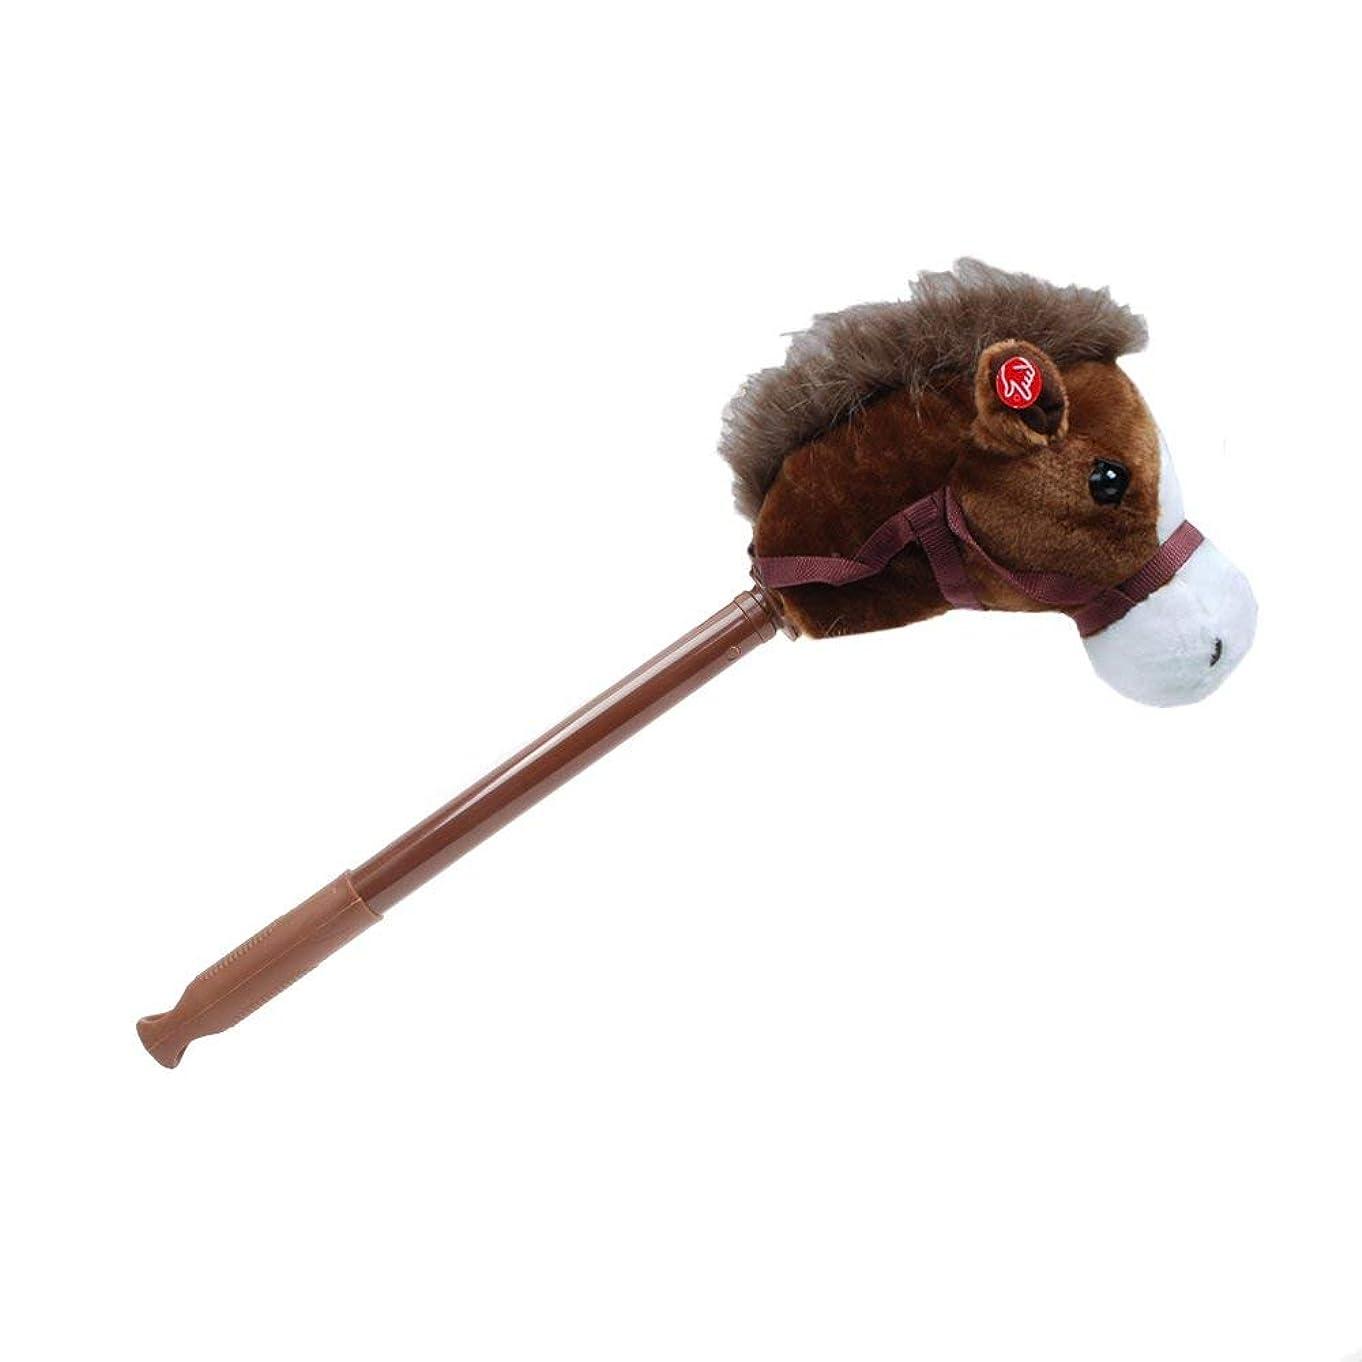 Linzy Hobby Adjustable Dark Brown Stick Horse - Adjustable to Three Heights: 21